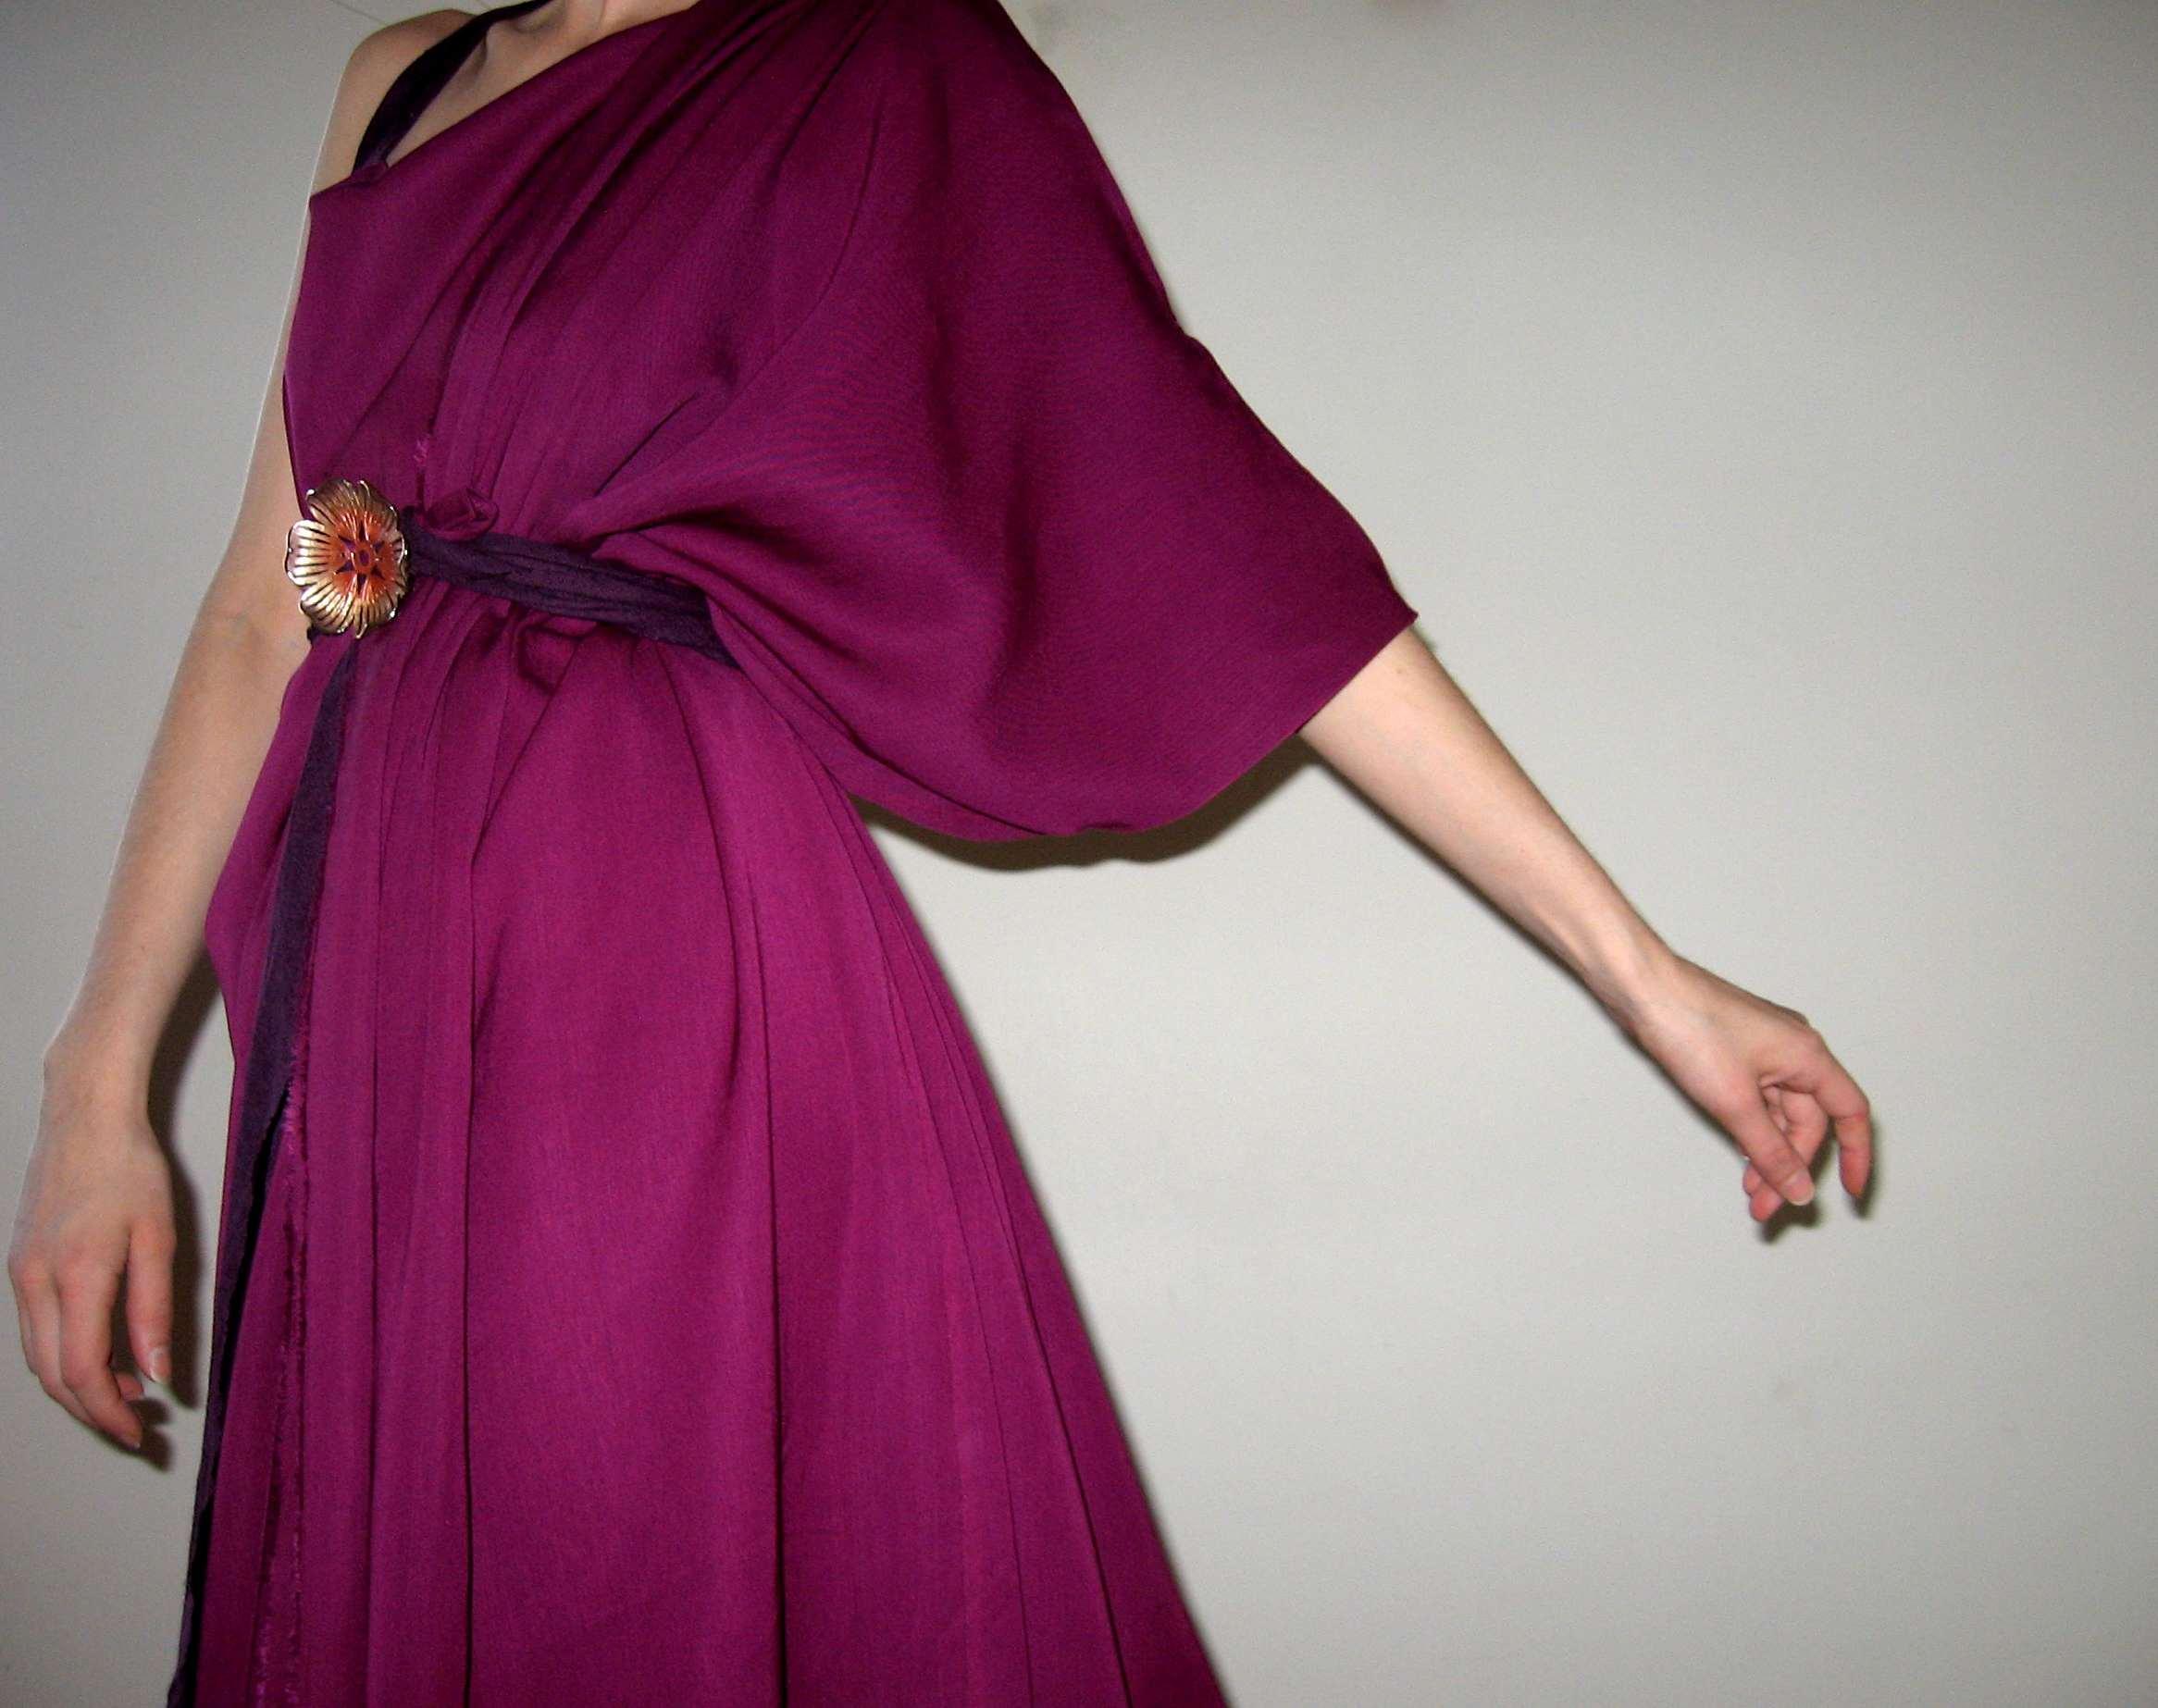 dress2a